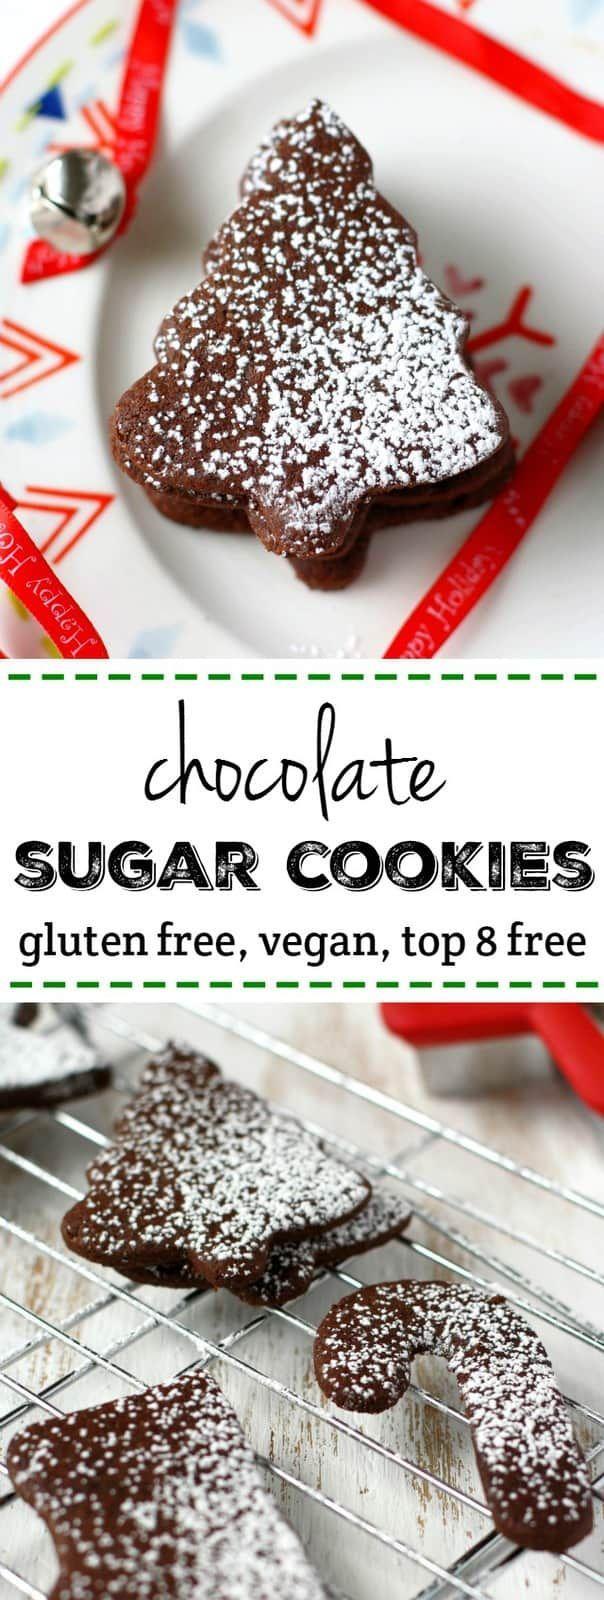 Chocolate Sugar Cookies (Gluten Free, Vegan)